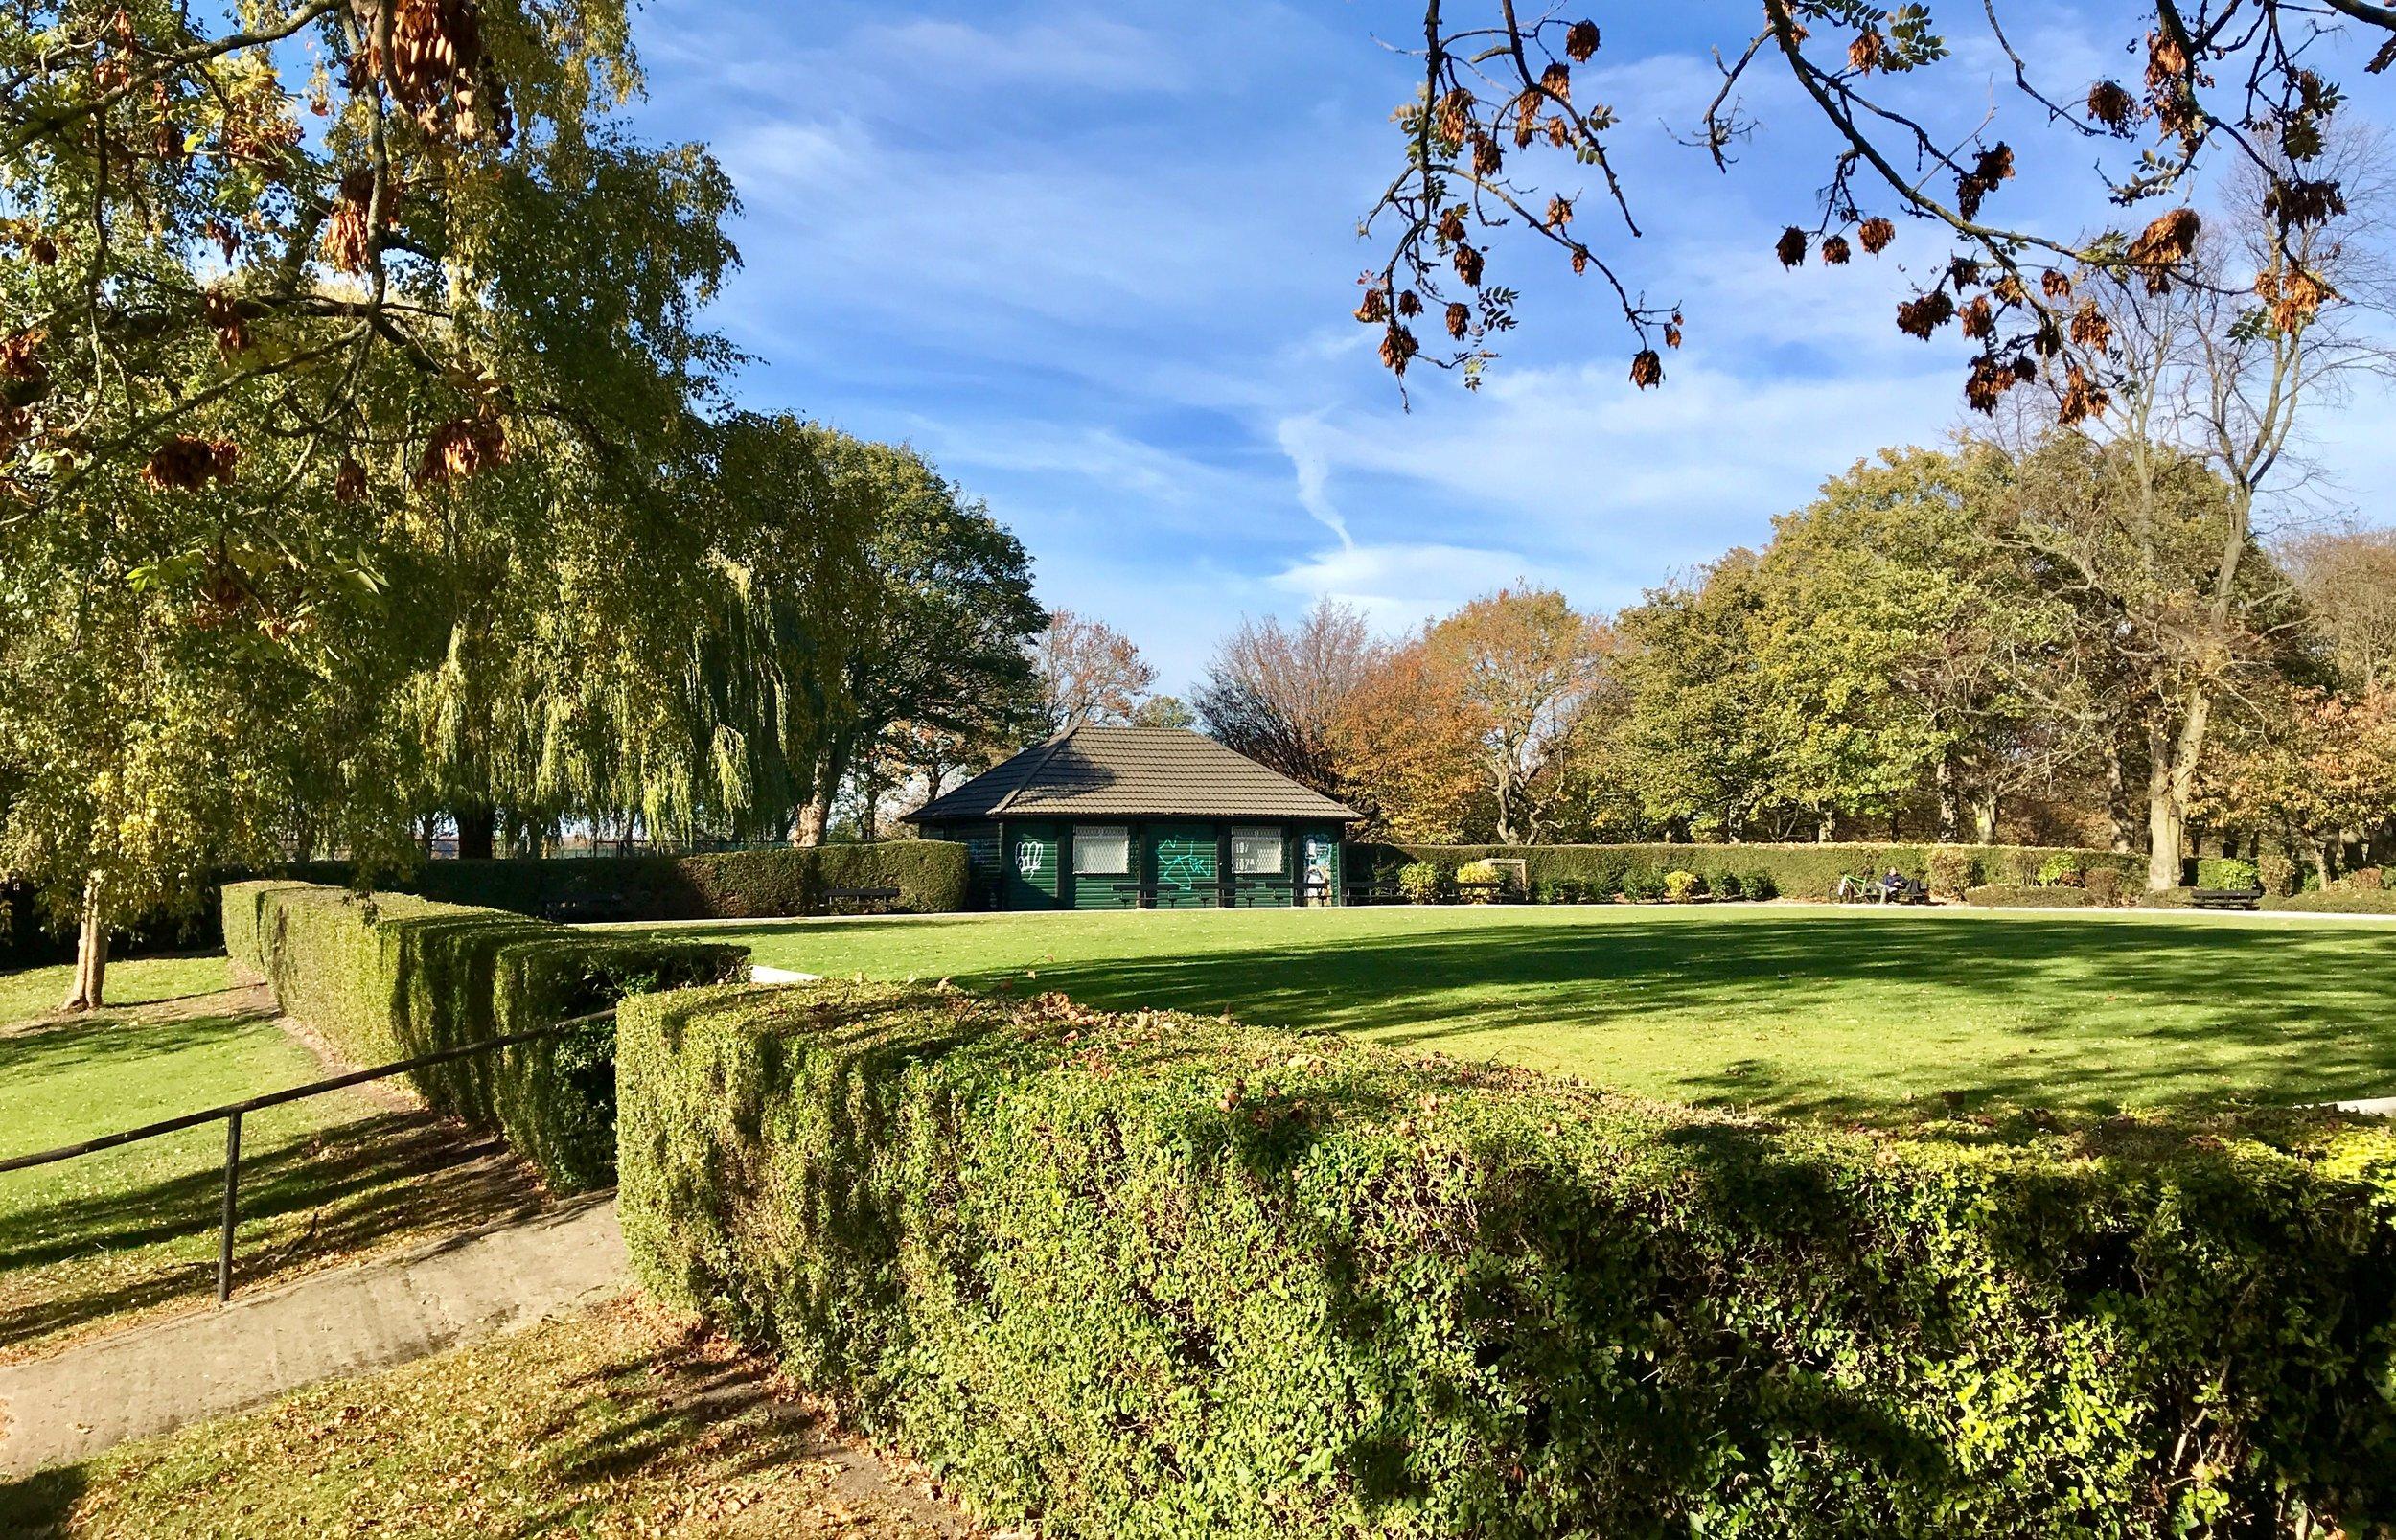 Bowling Green, Woodhouse Moor © HP